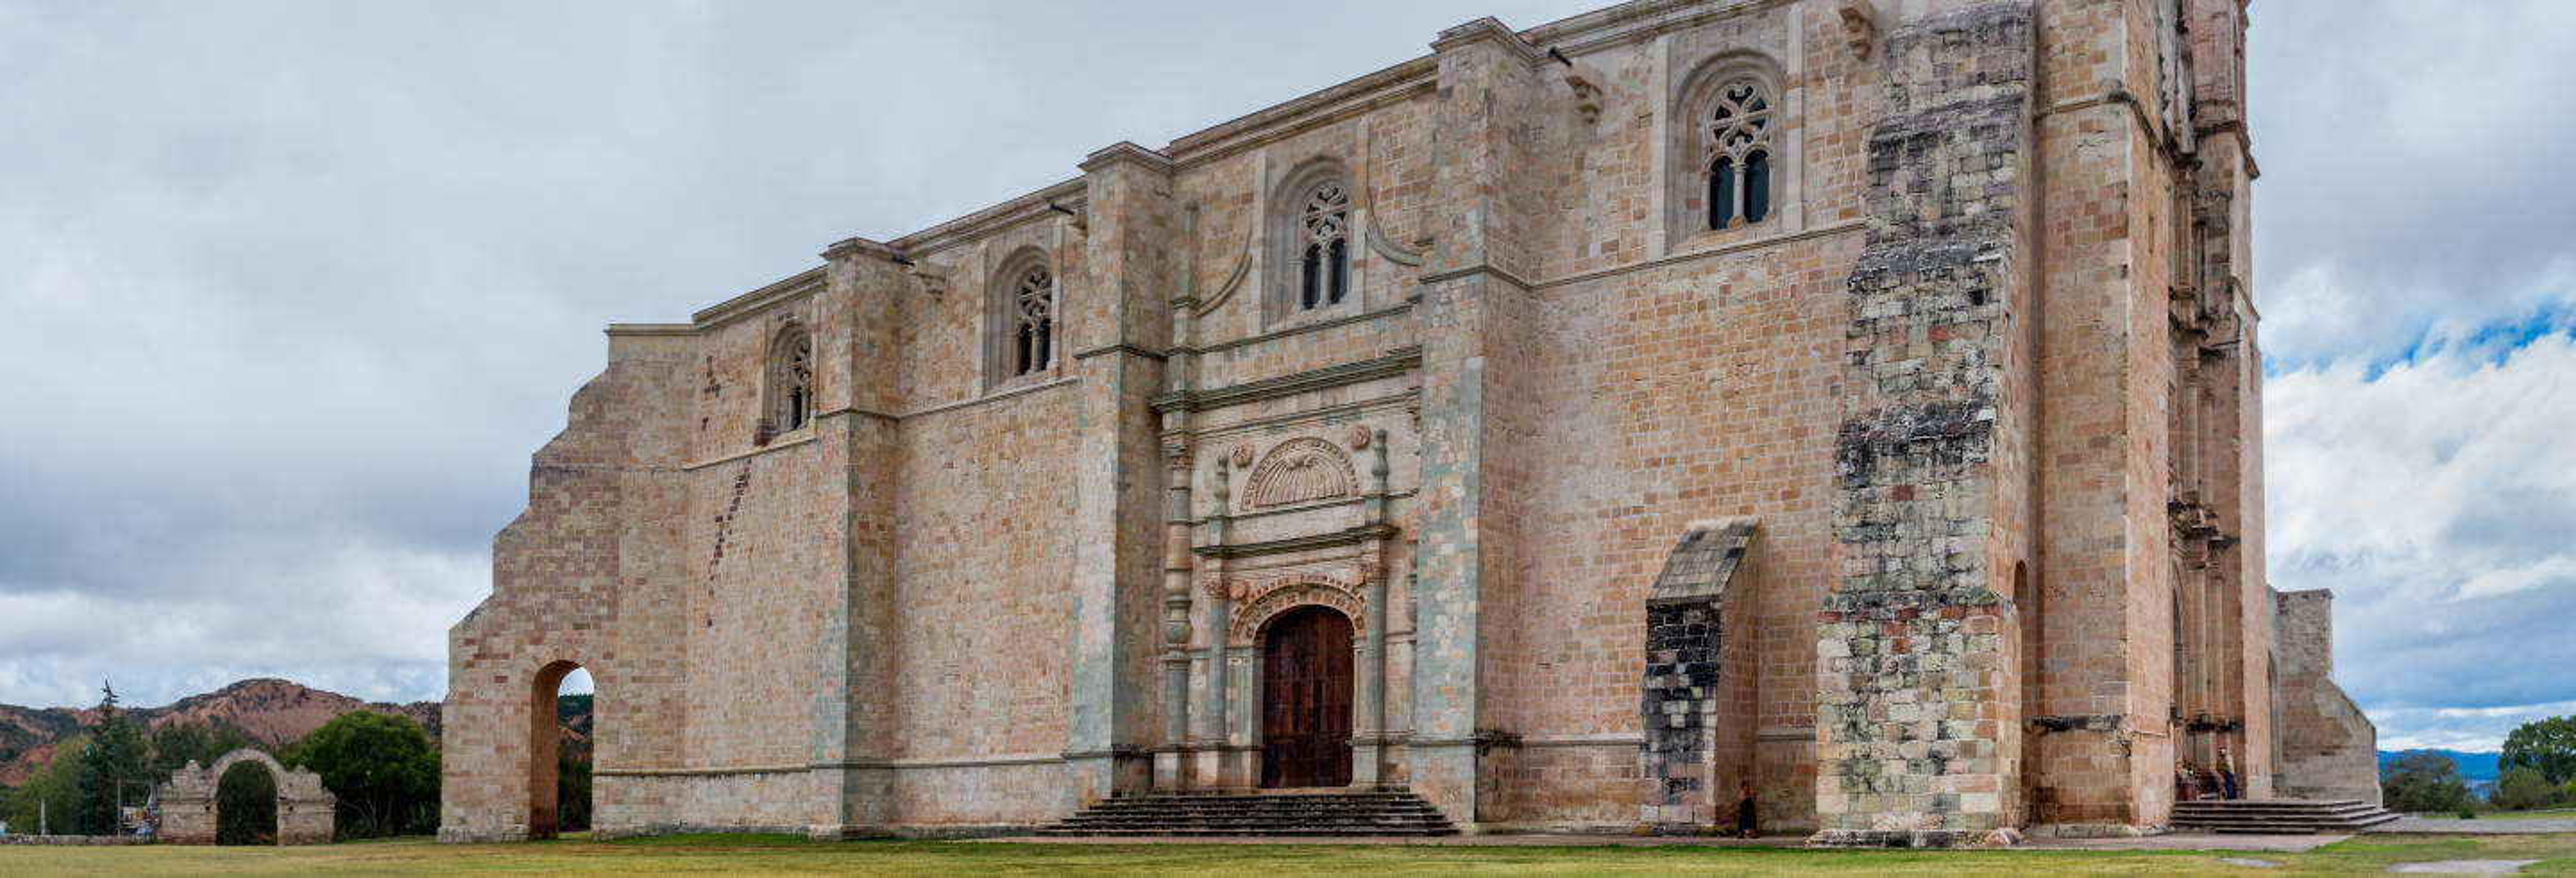 Tour de la arquitectura virreinal por Mixteca